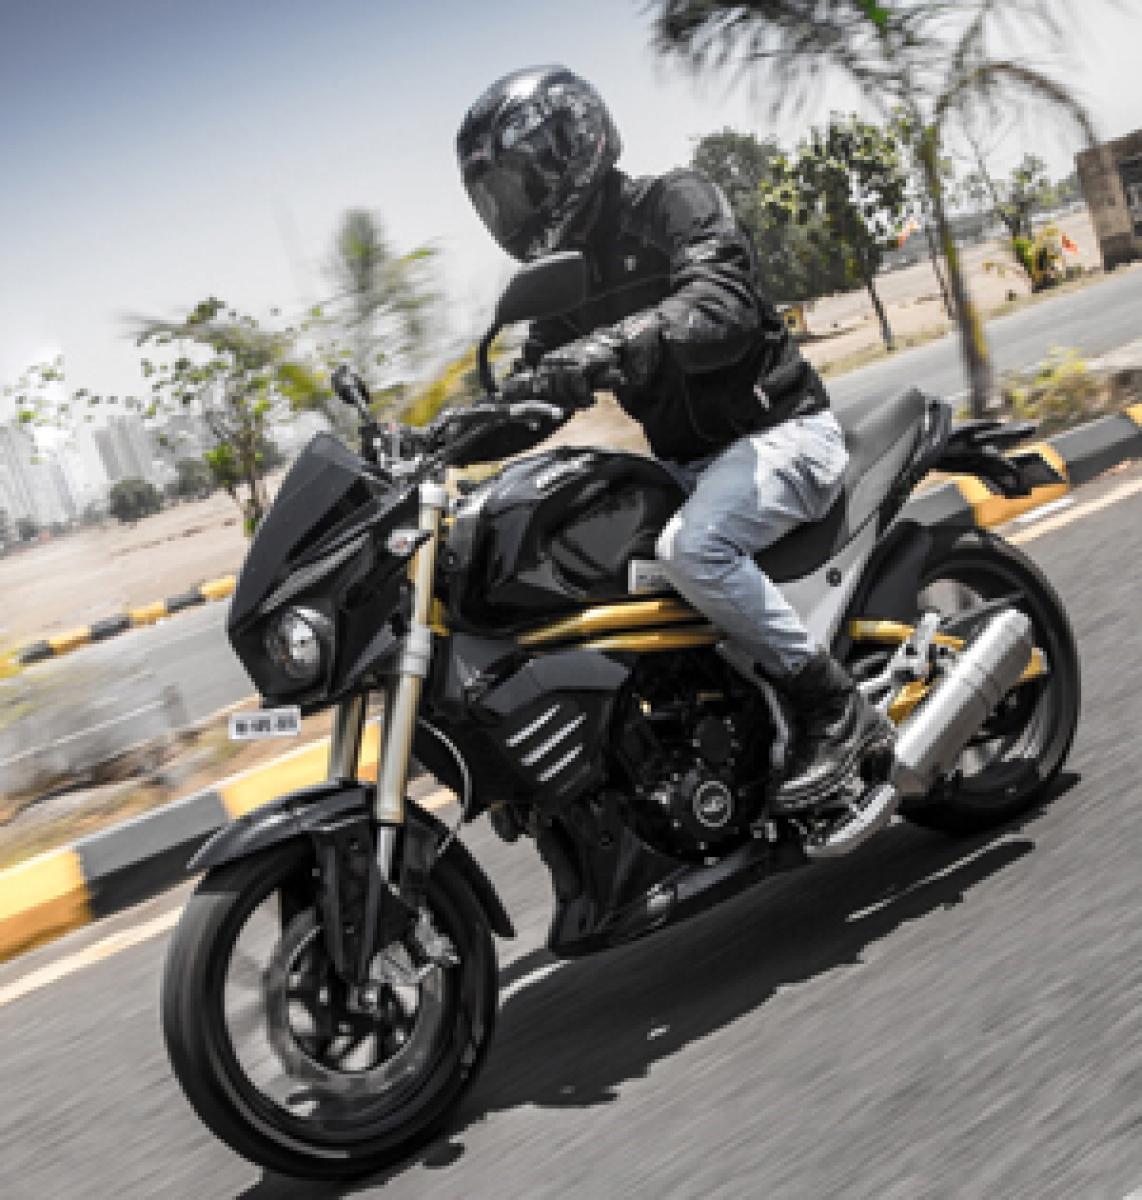 Mahindra shifts focus to premium two-wheelers